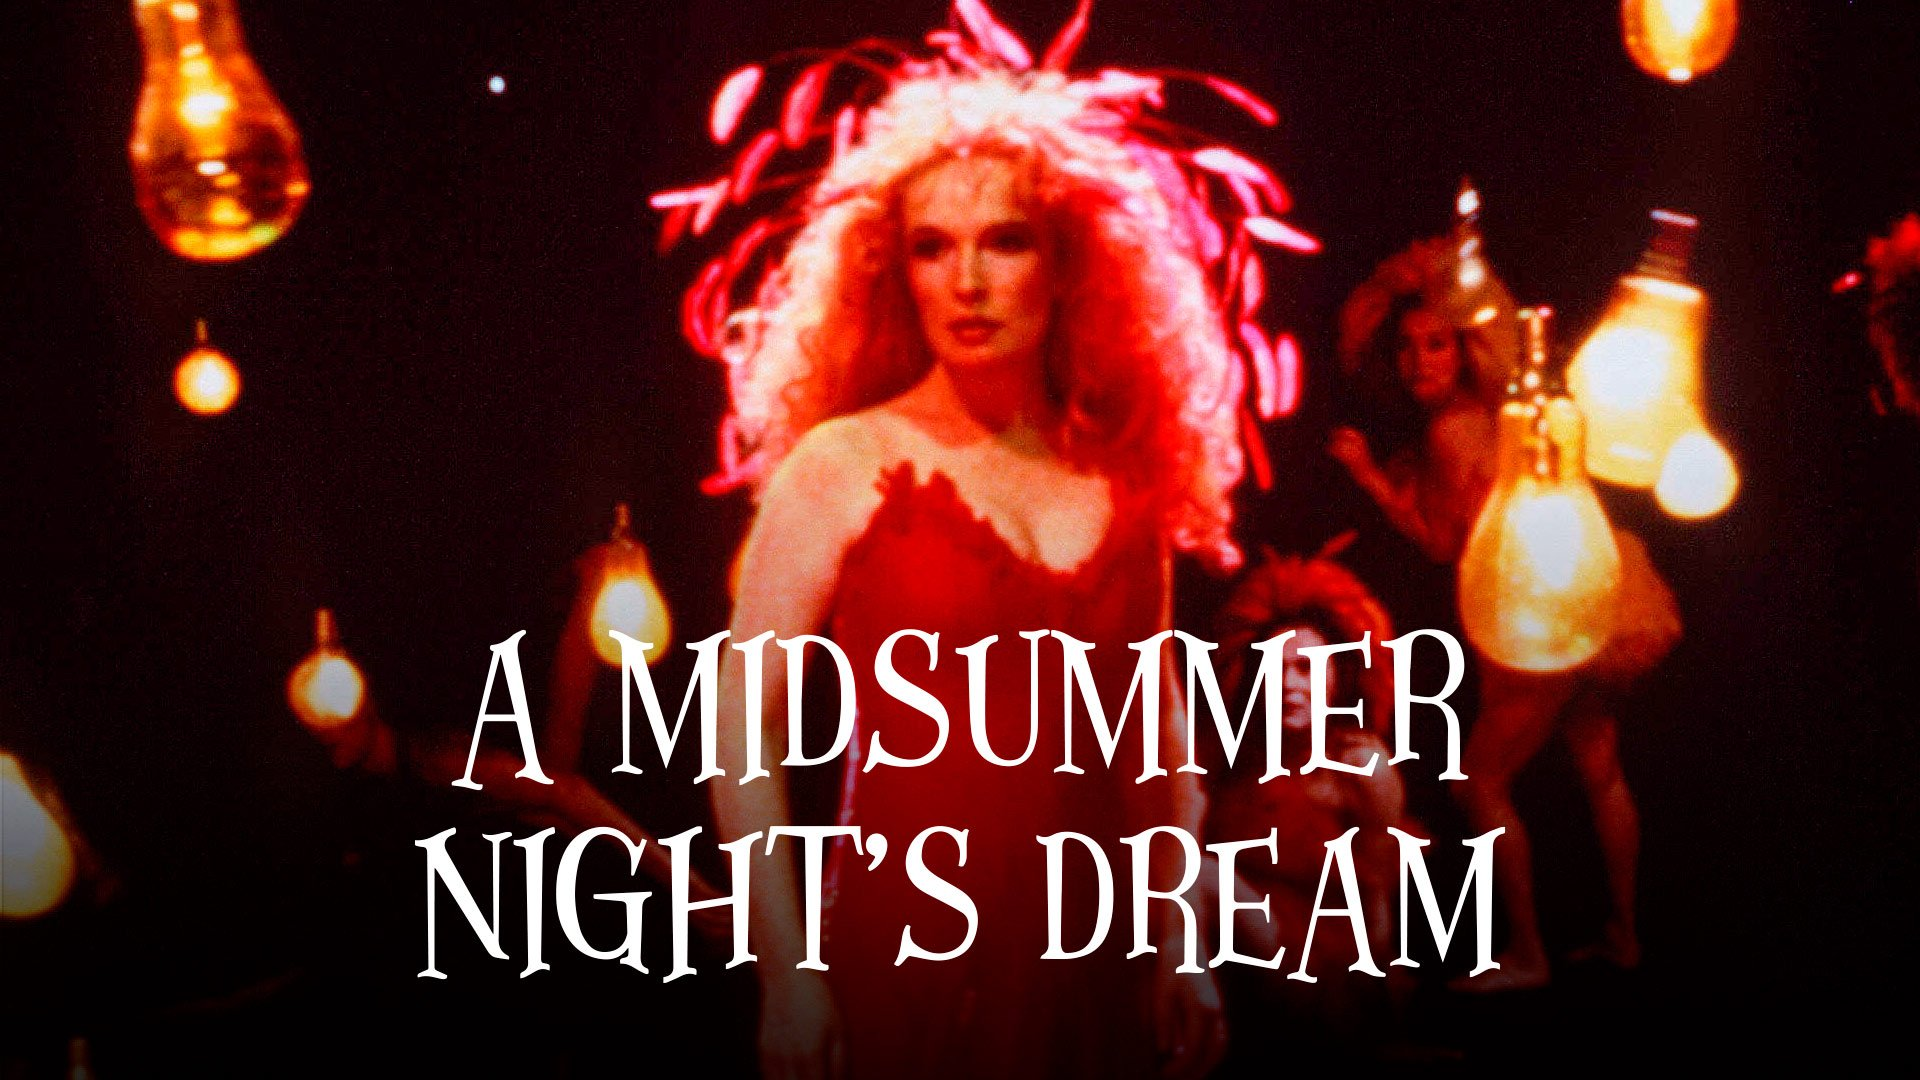 A Midsummer Night's Dream on BritBox UK